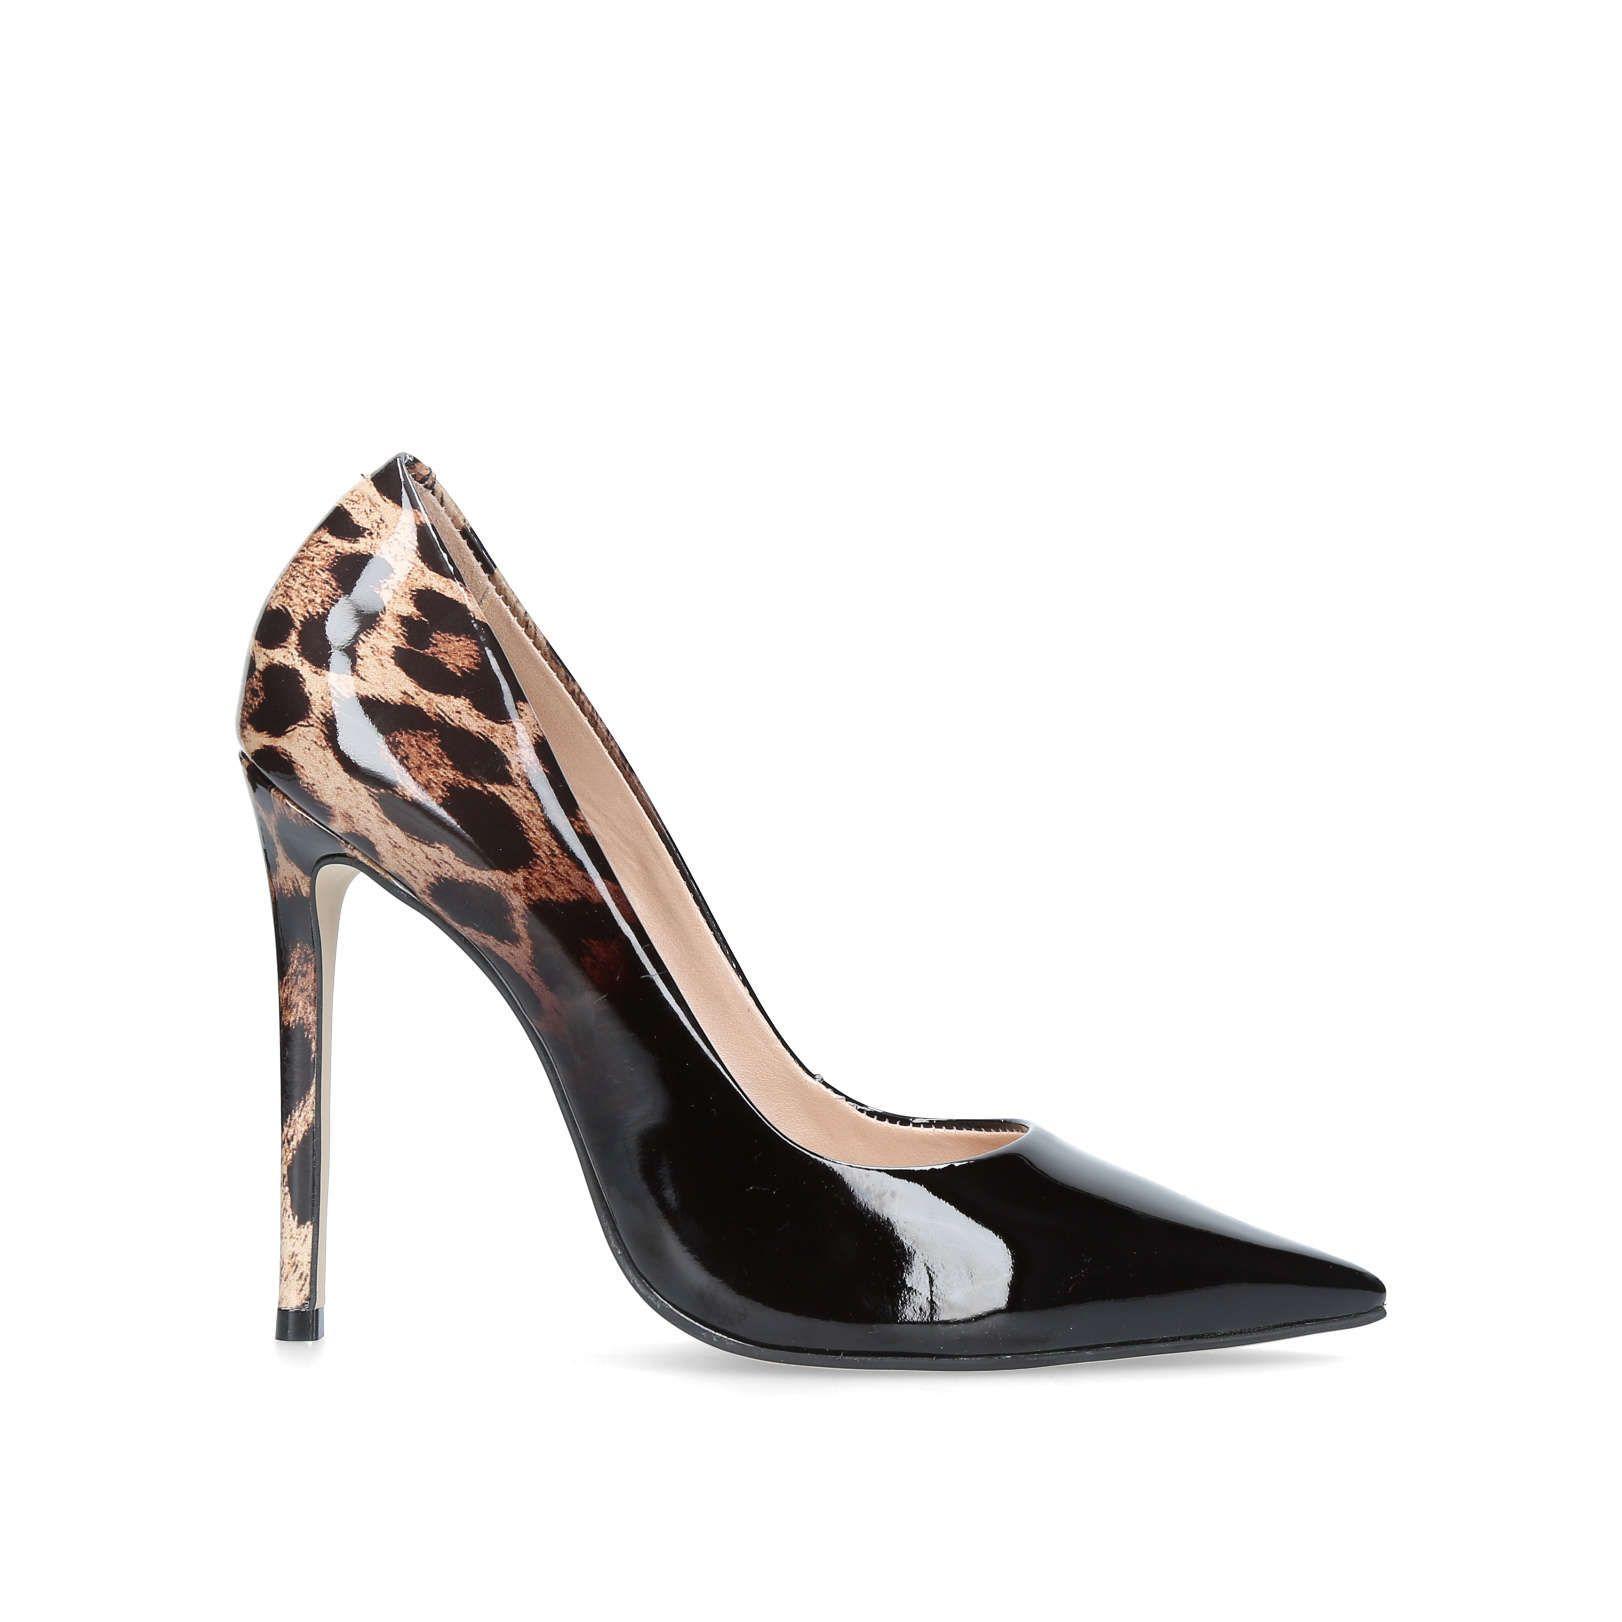 Shop ALICE Black High Heel Court Shoes